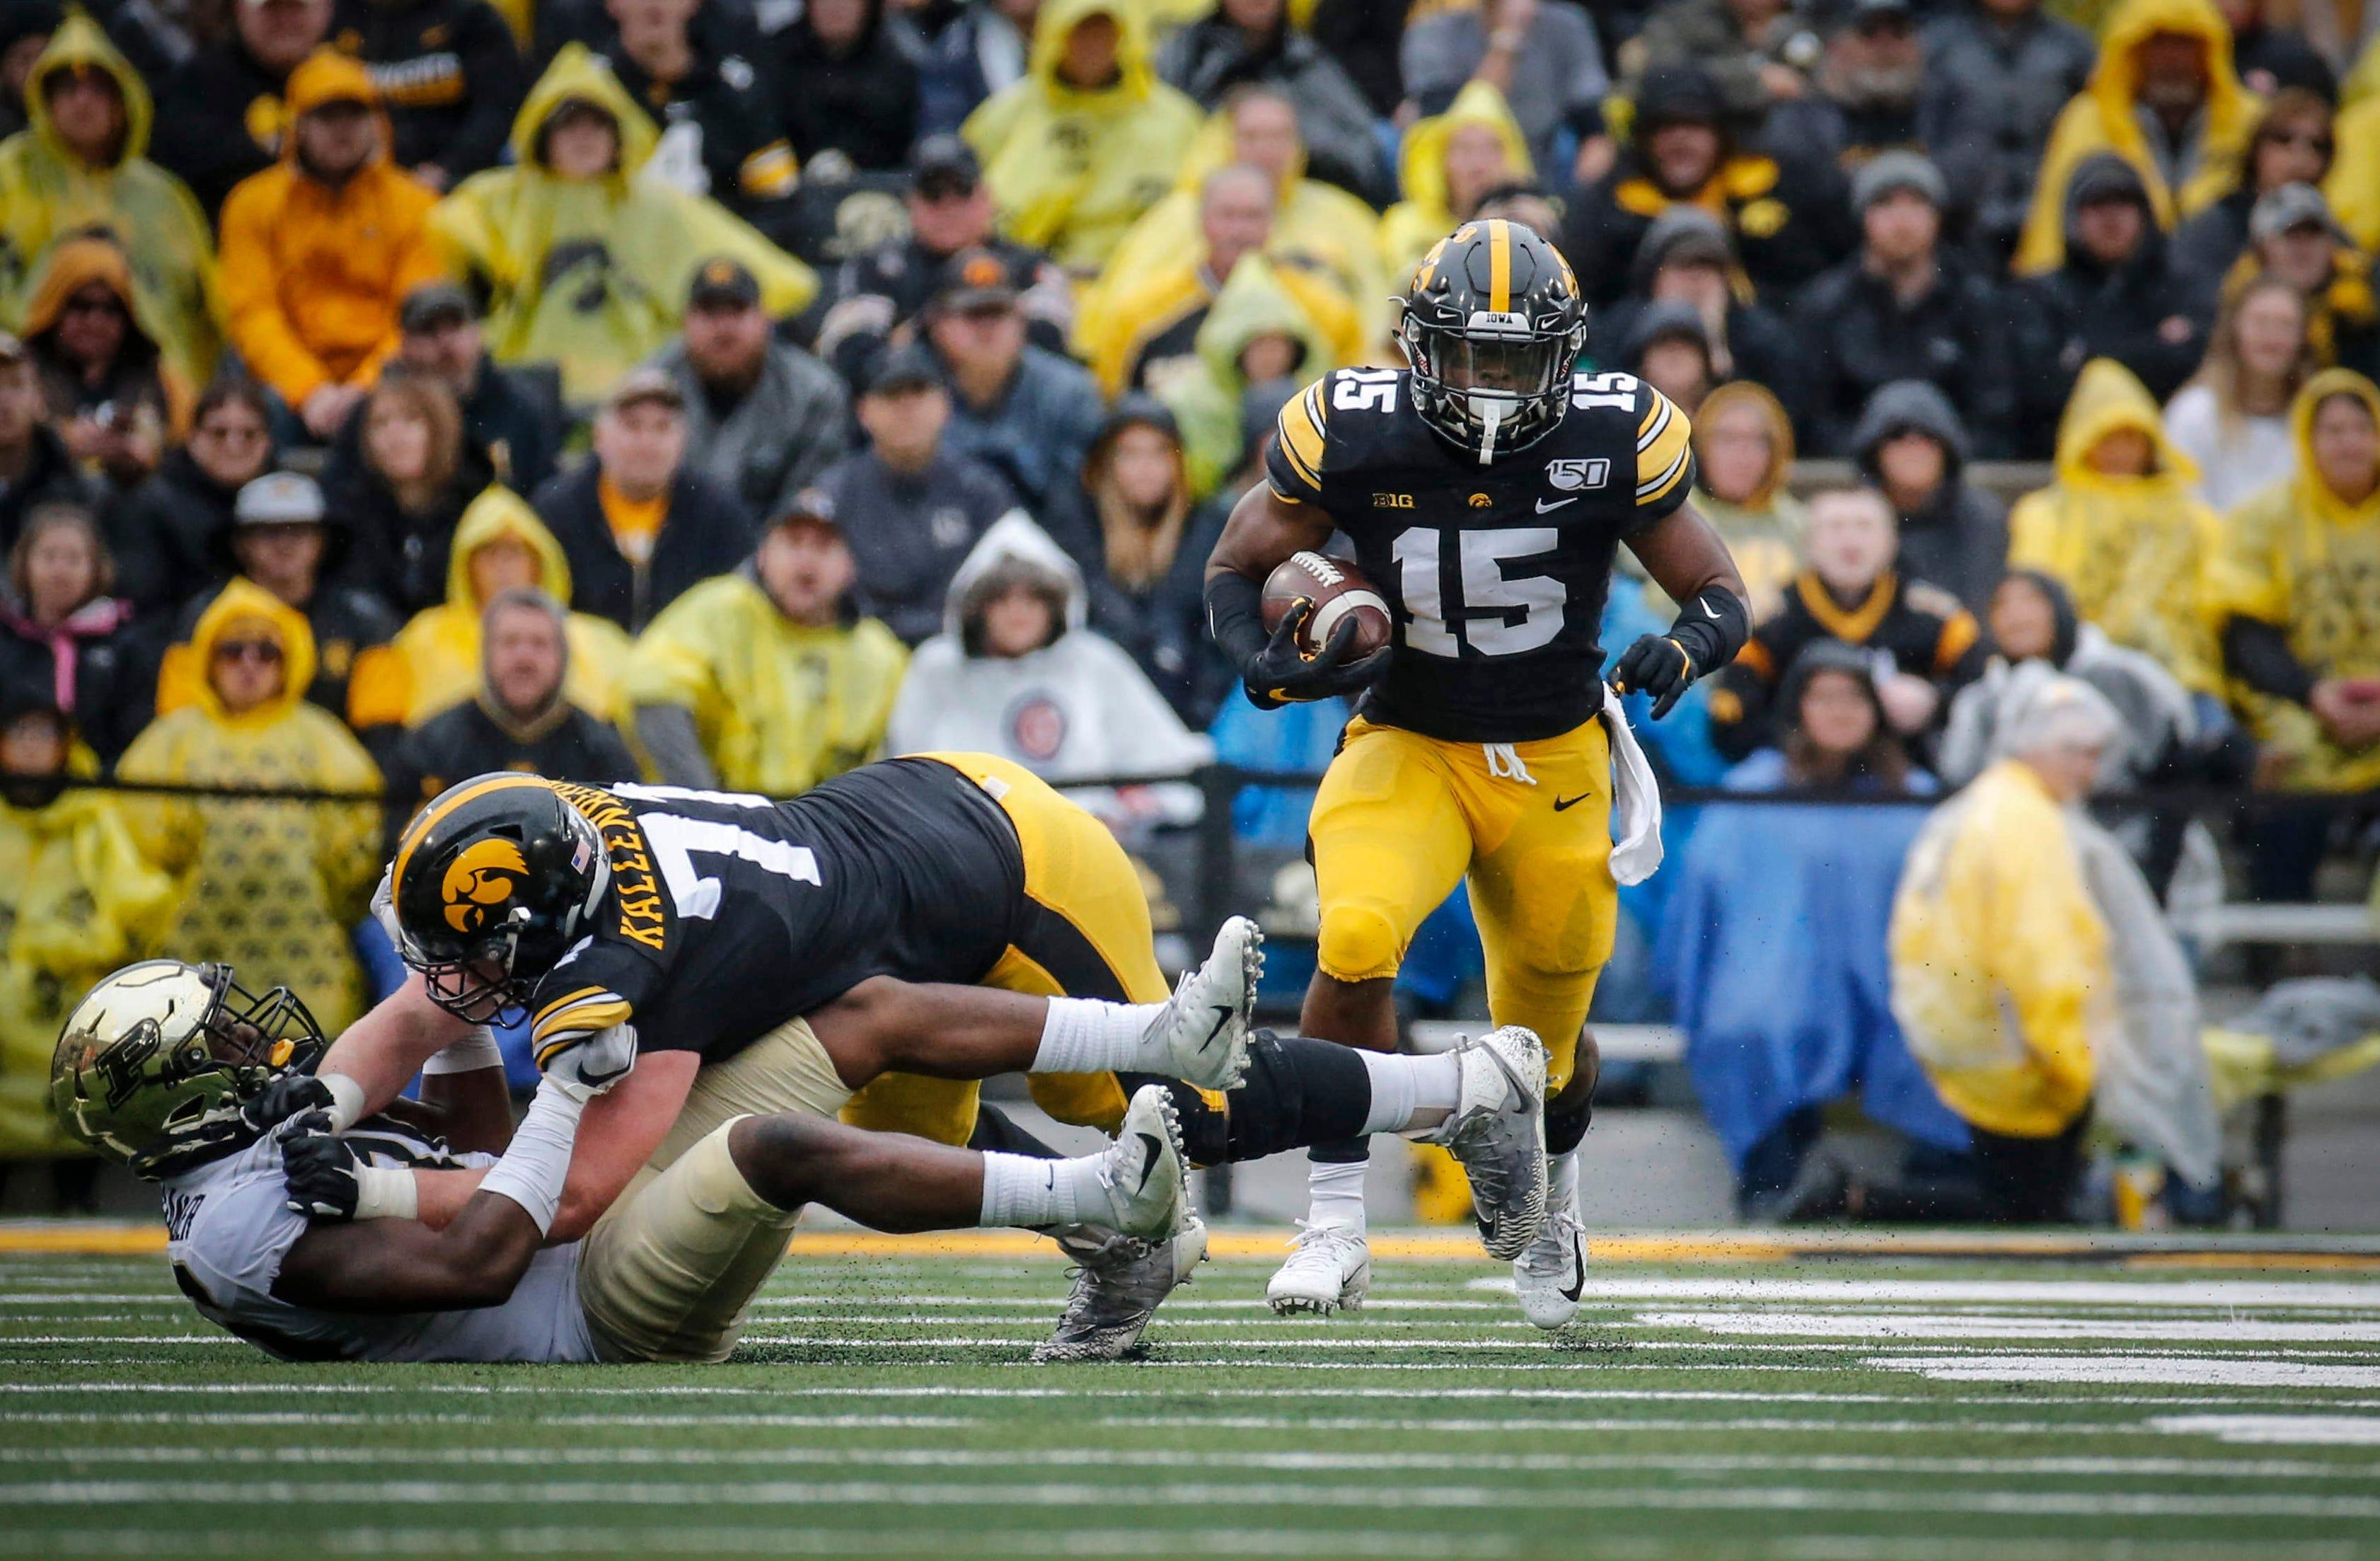 Photos: No. 22 Iowa defeats Purdue on homecoming at Kinnick Stadium